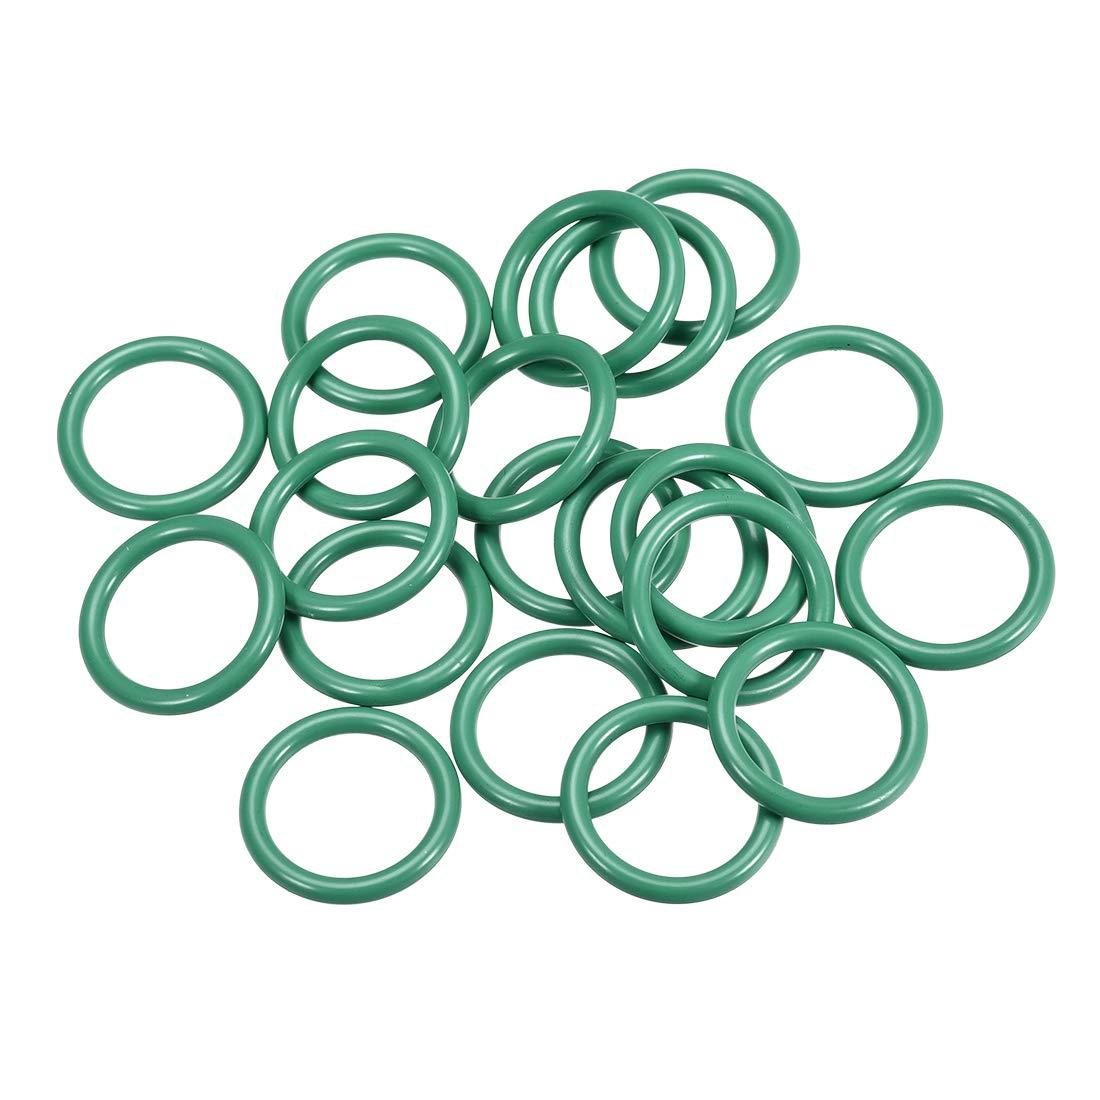 2.4mm Width uxcell Fluorine Rubber O Rings 27mm OD Seal Gasket Green 20Pcs 22.2mm Inner Diameter